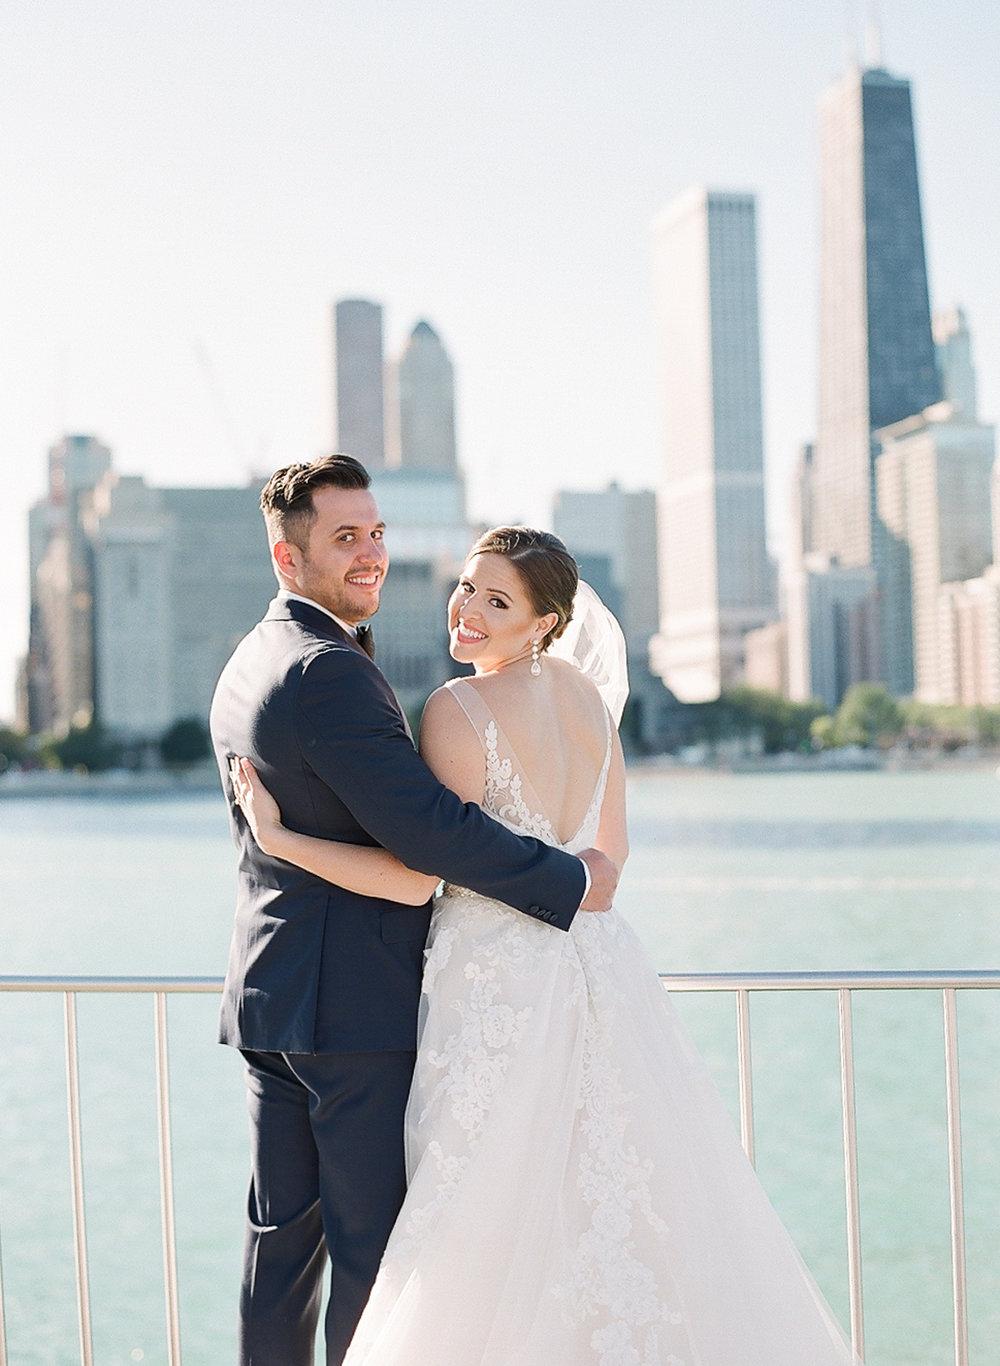 Bonphotage Chicago Fine Art Wedding Photography - Morgan's on Fulton